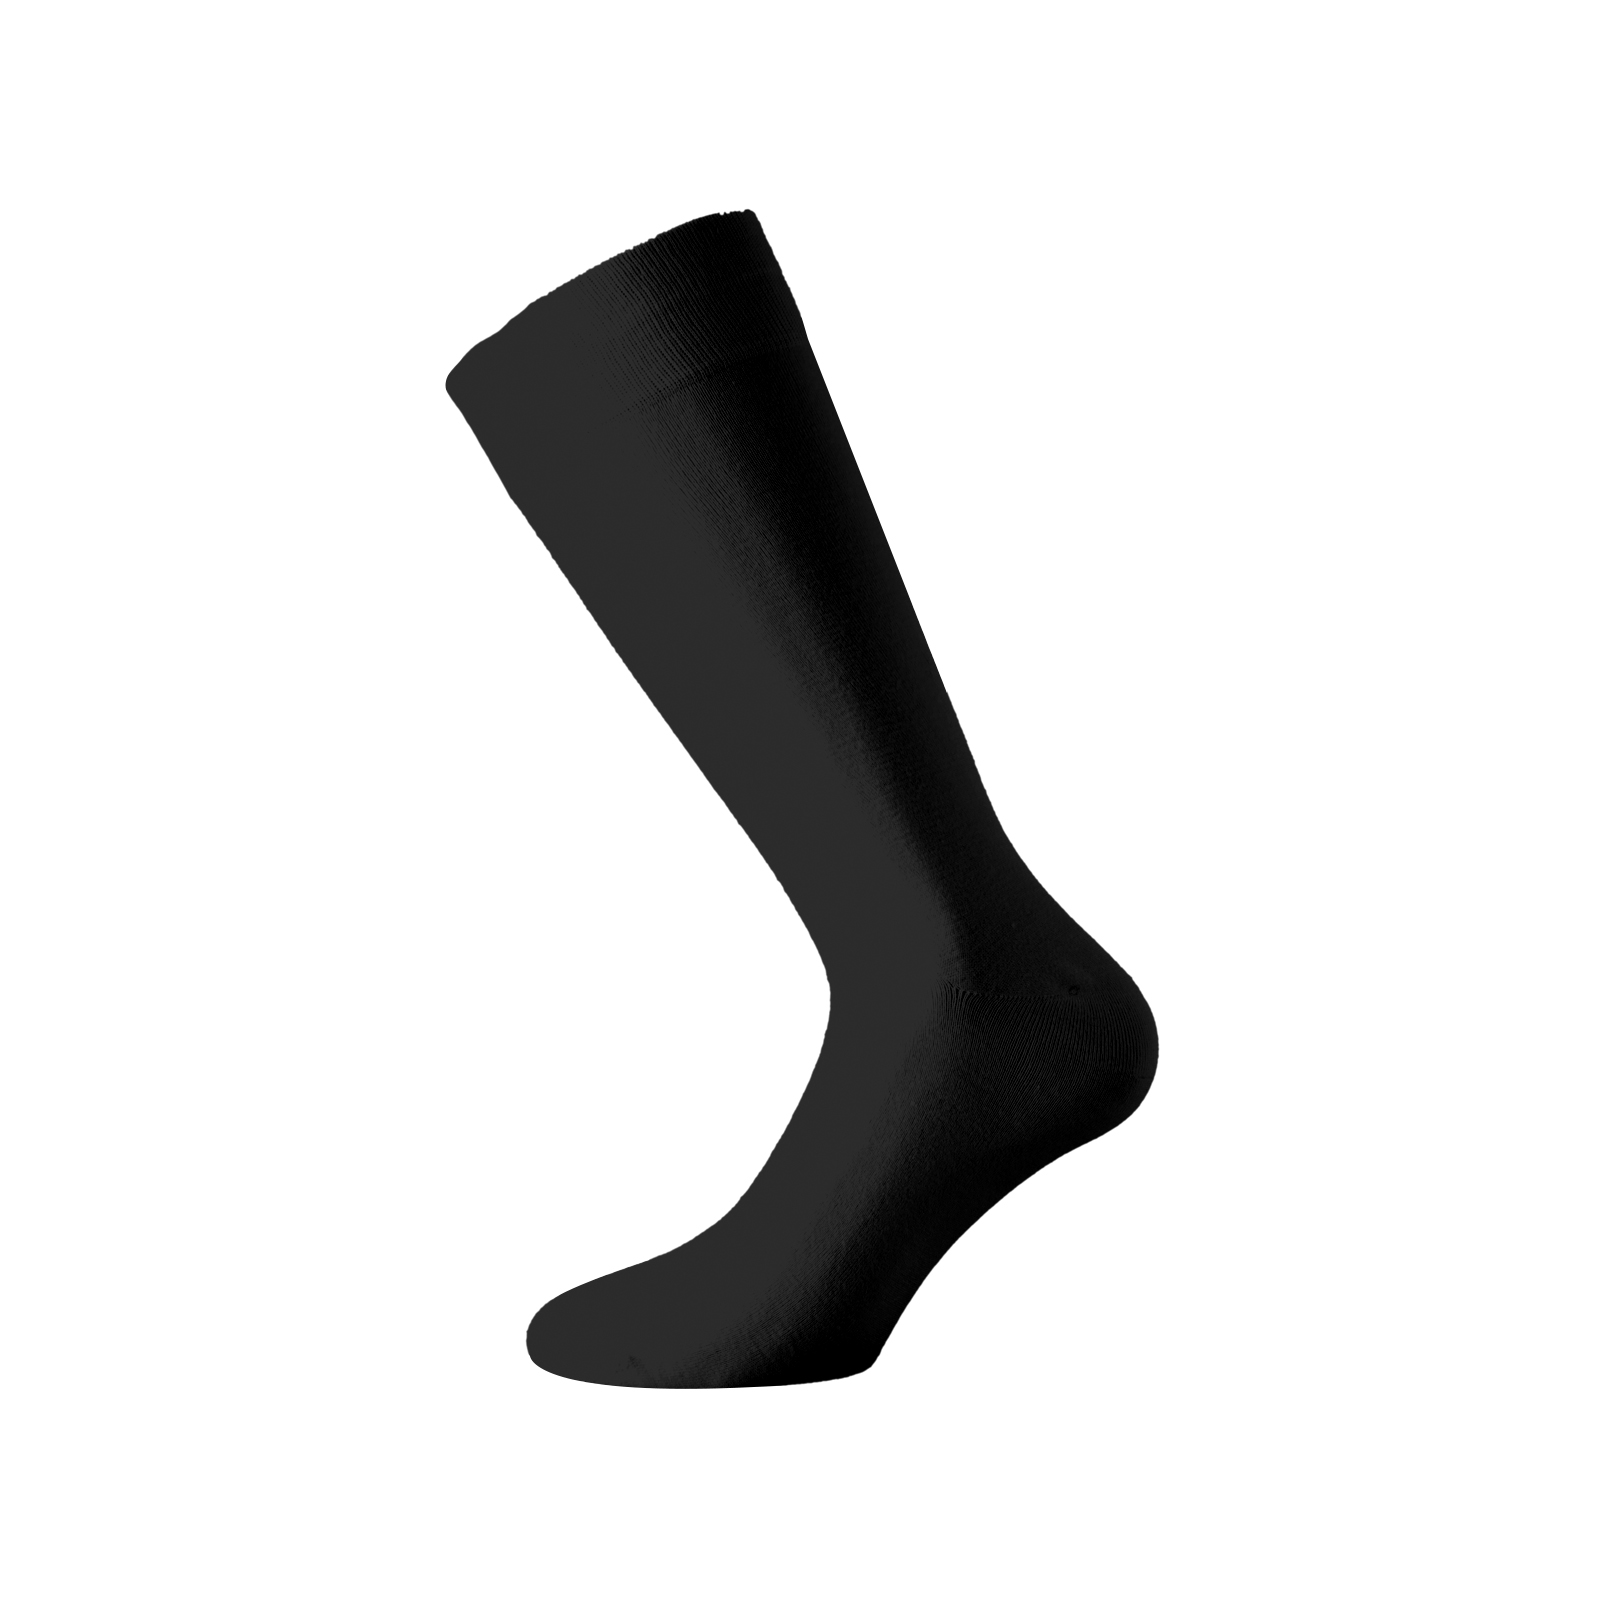 Walk Ανδρική κάλτσα - Bamboo - Aντιβακτηριδιακή δράση - Μαύρη